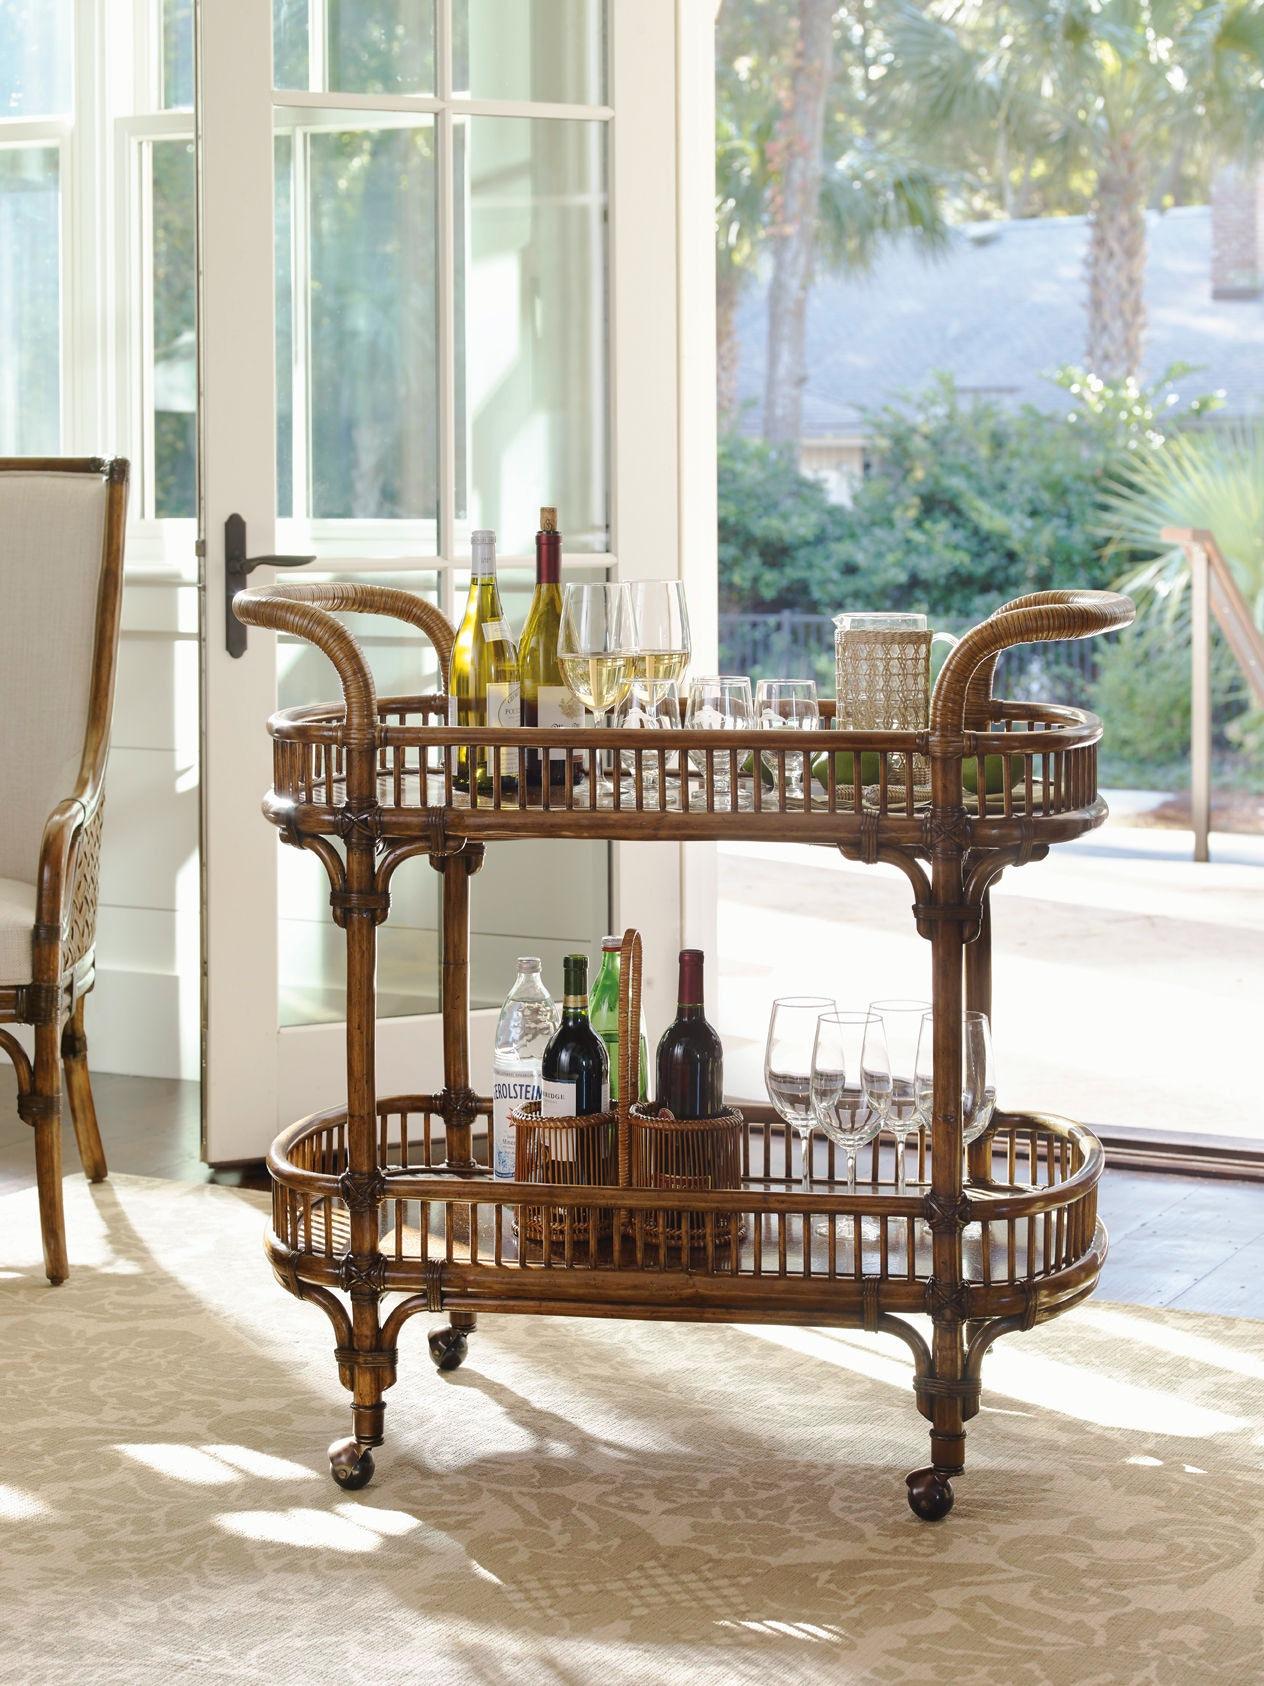 Veranda home furnishings and design